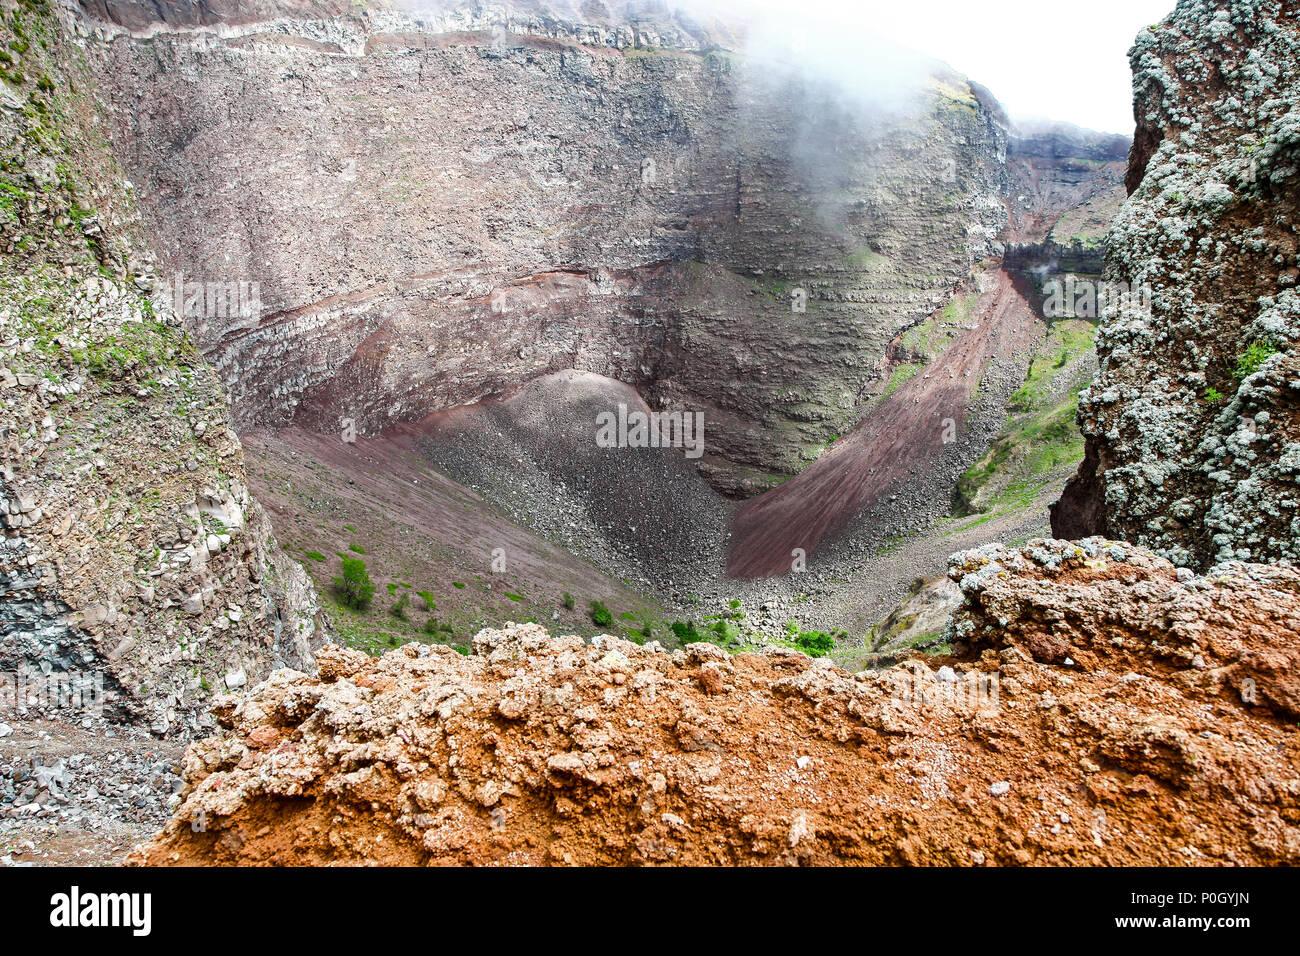 Vesuvius, Mount Vesuvius or in Italian Vesuvio, is an active volcano that rises above the Bay of Naples on the plain of Campania in Italy - Stock Image